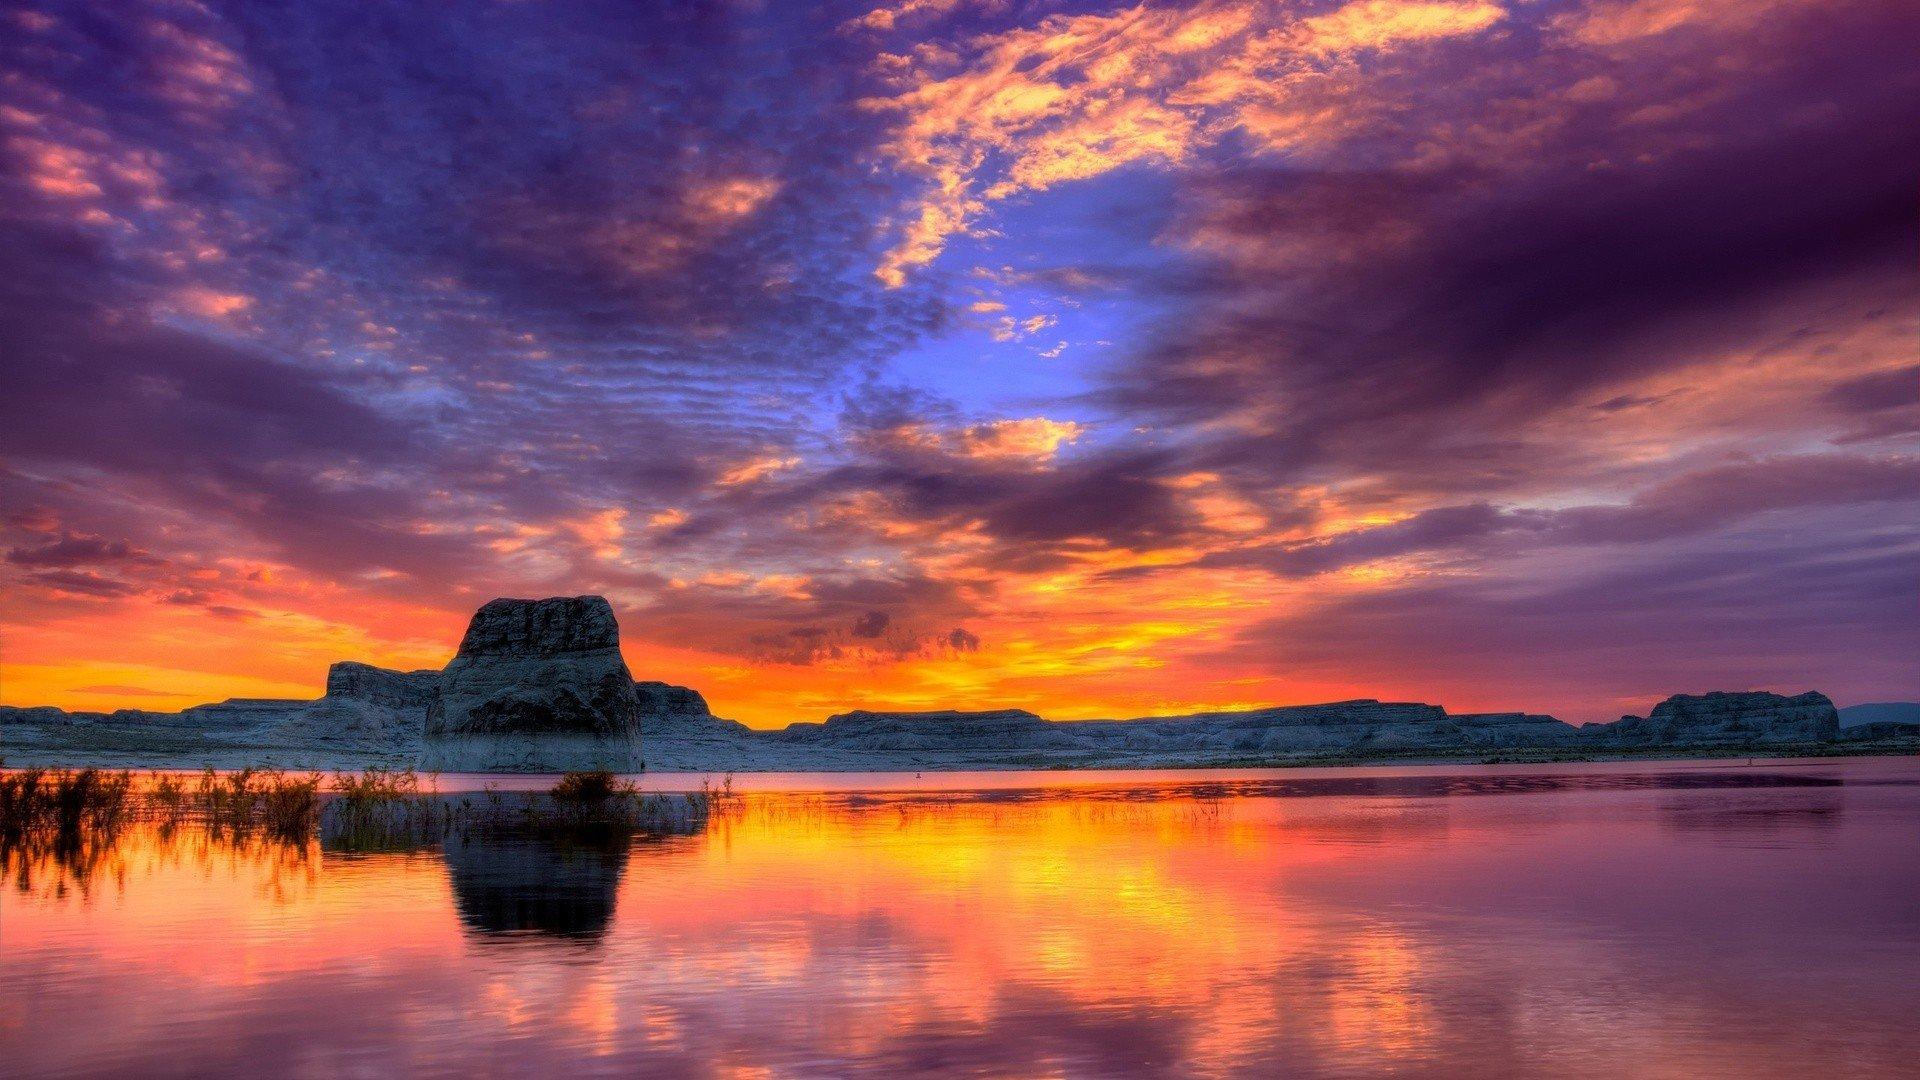 HD Lake Sunset   Best Ultra HD Wallpapers 1920x1080